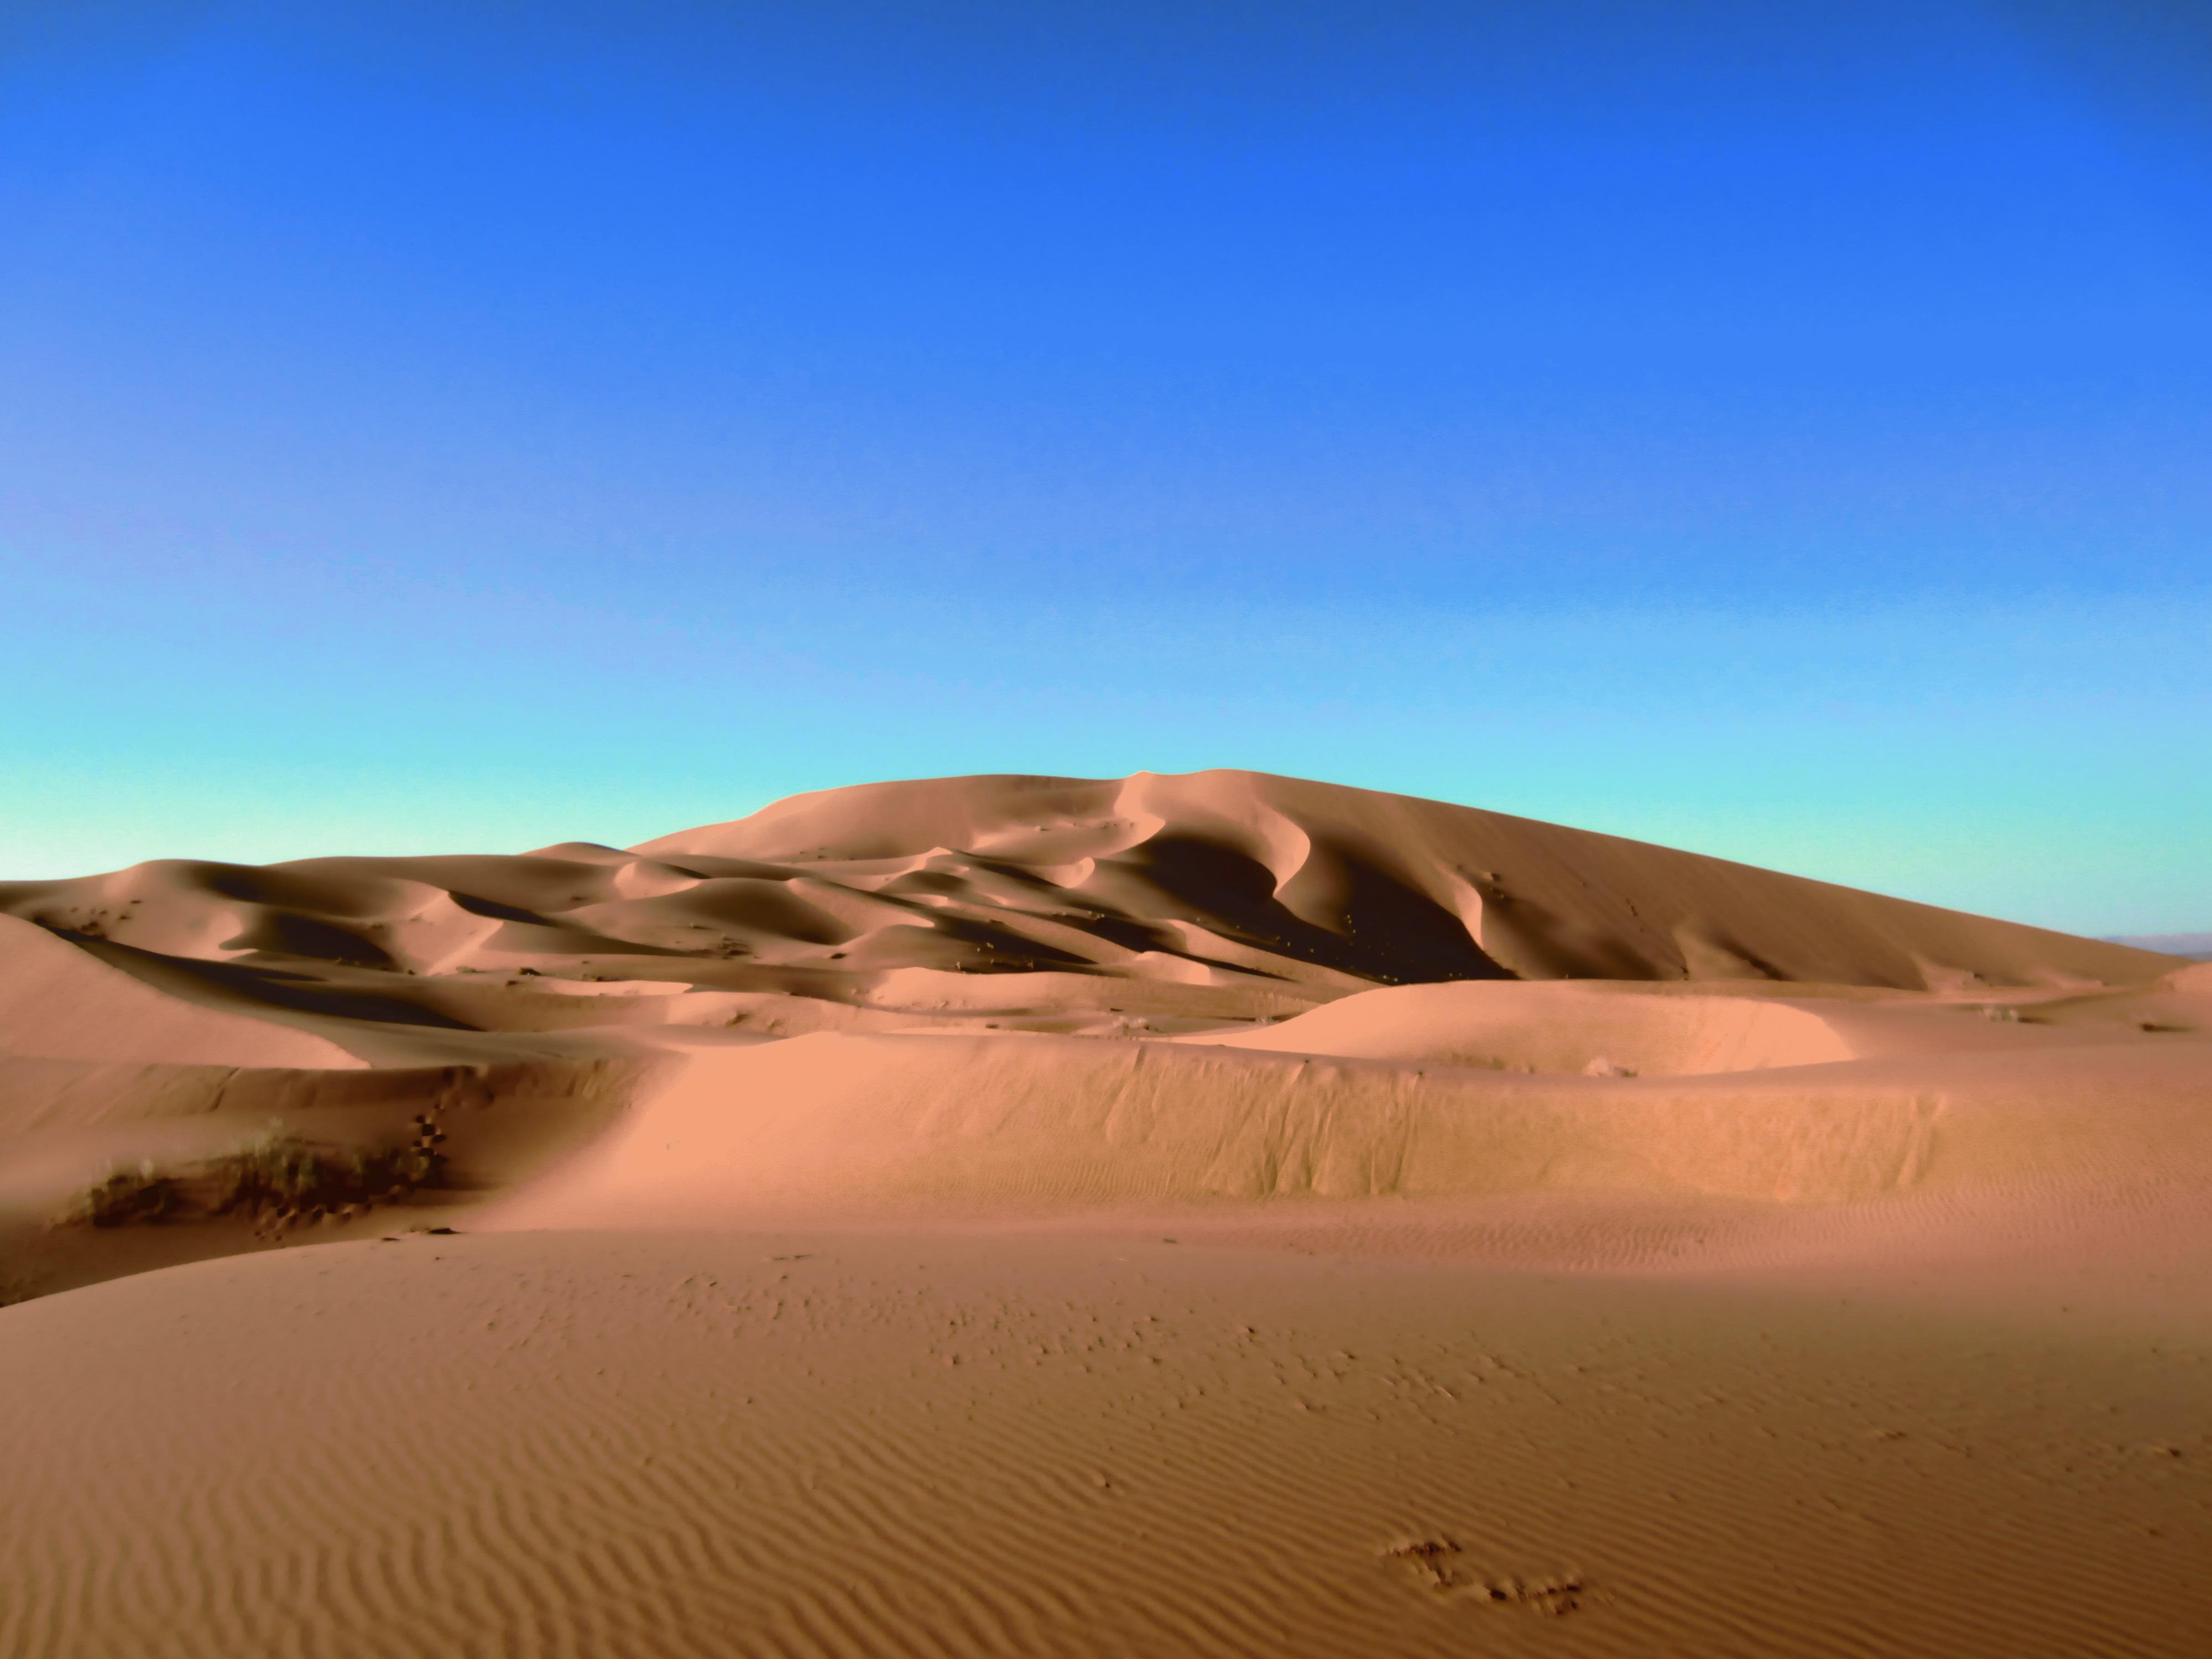 sahara desert images - HD4000×3000